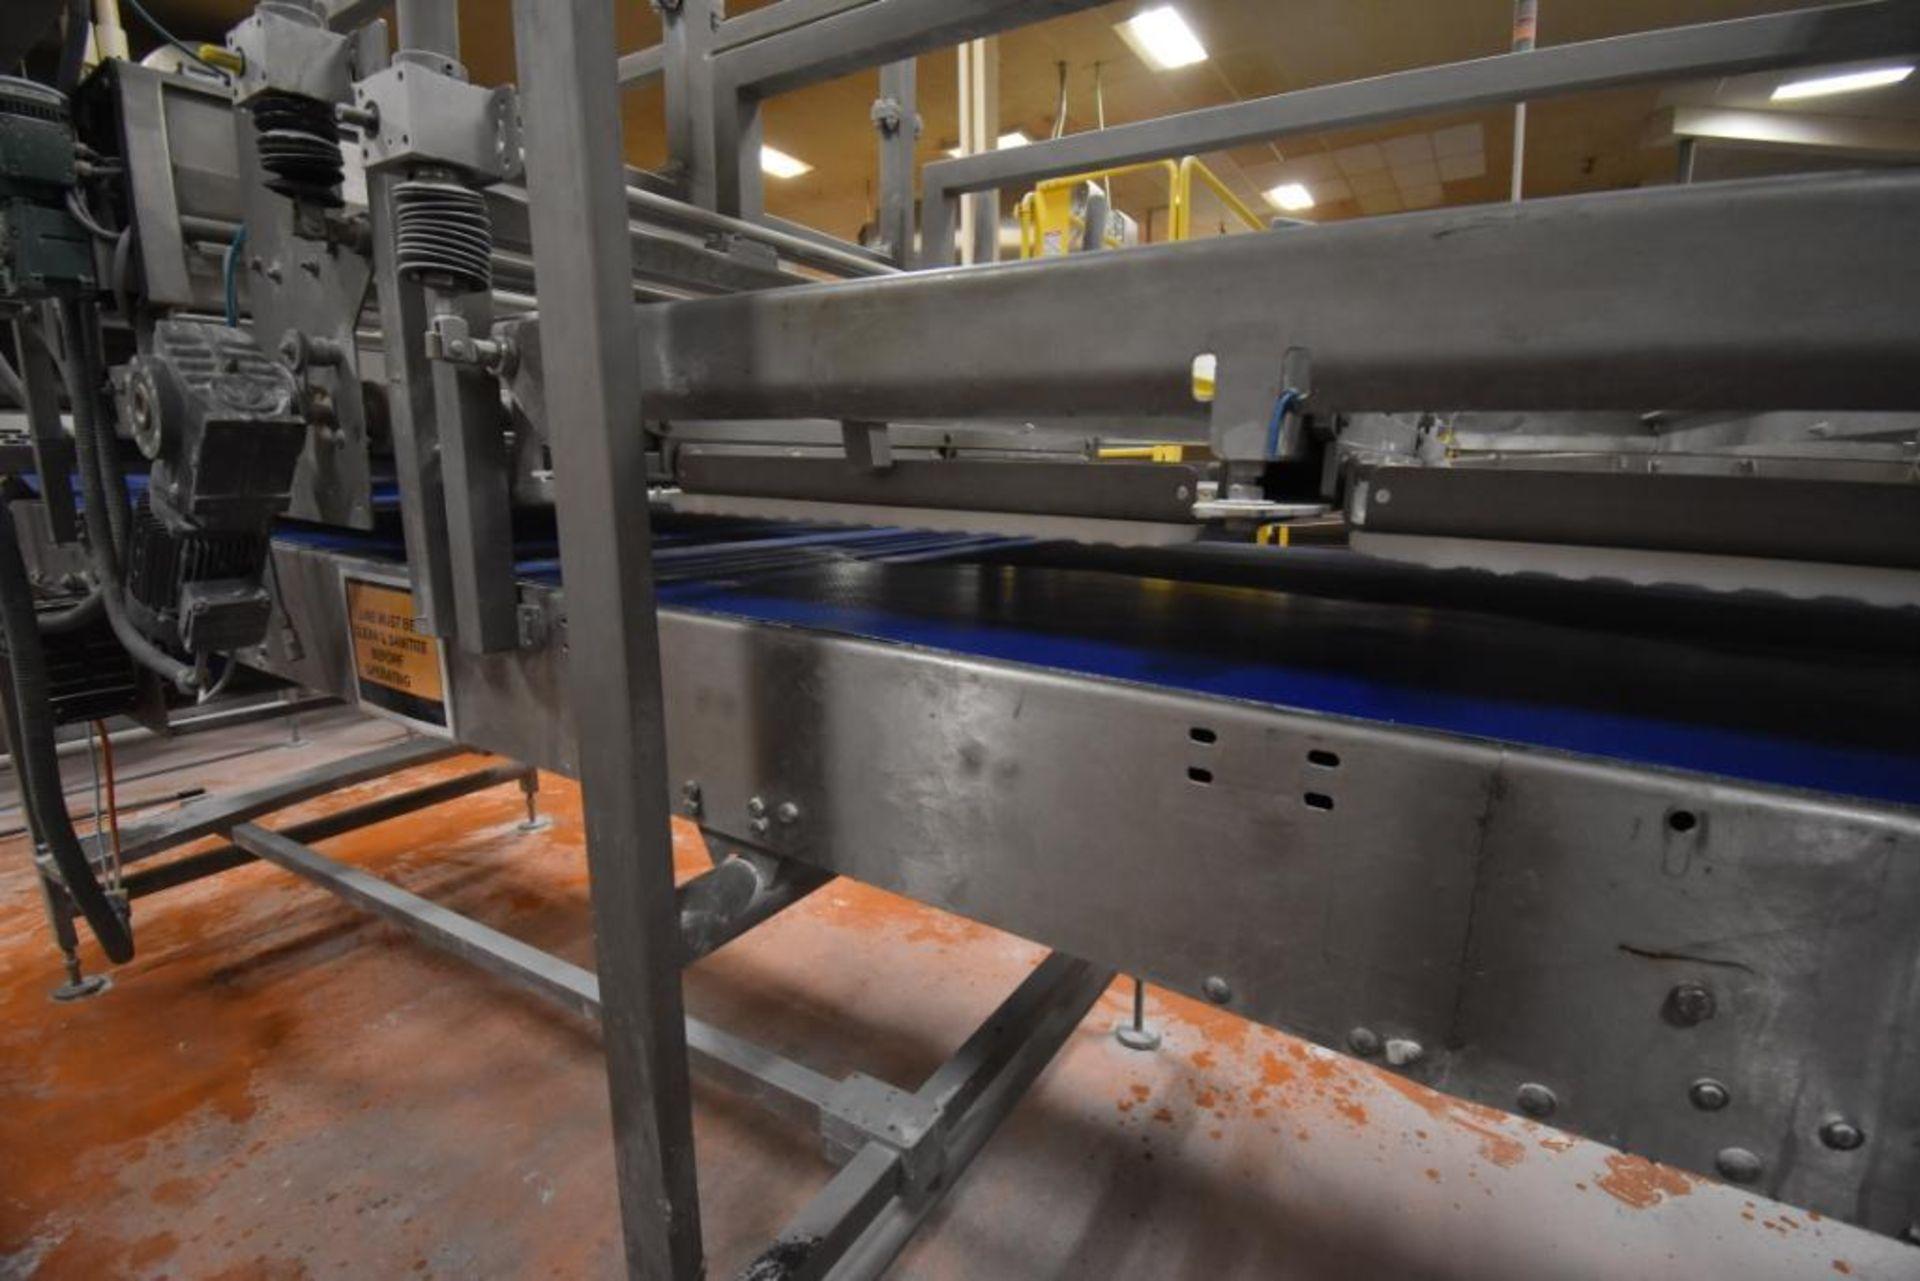 2007 Fritsch Laminator 3000 dough line - Image 217 of 280